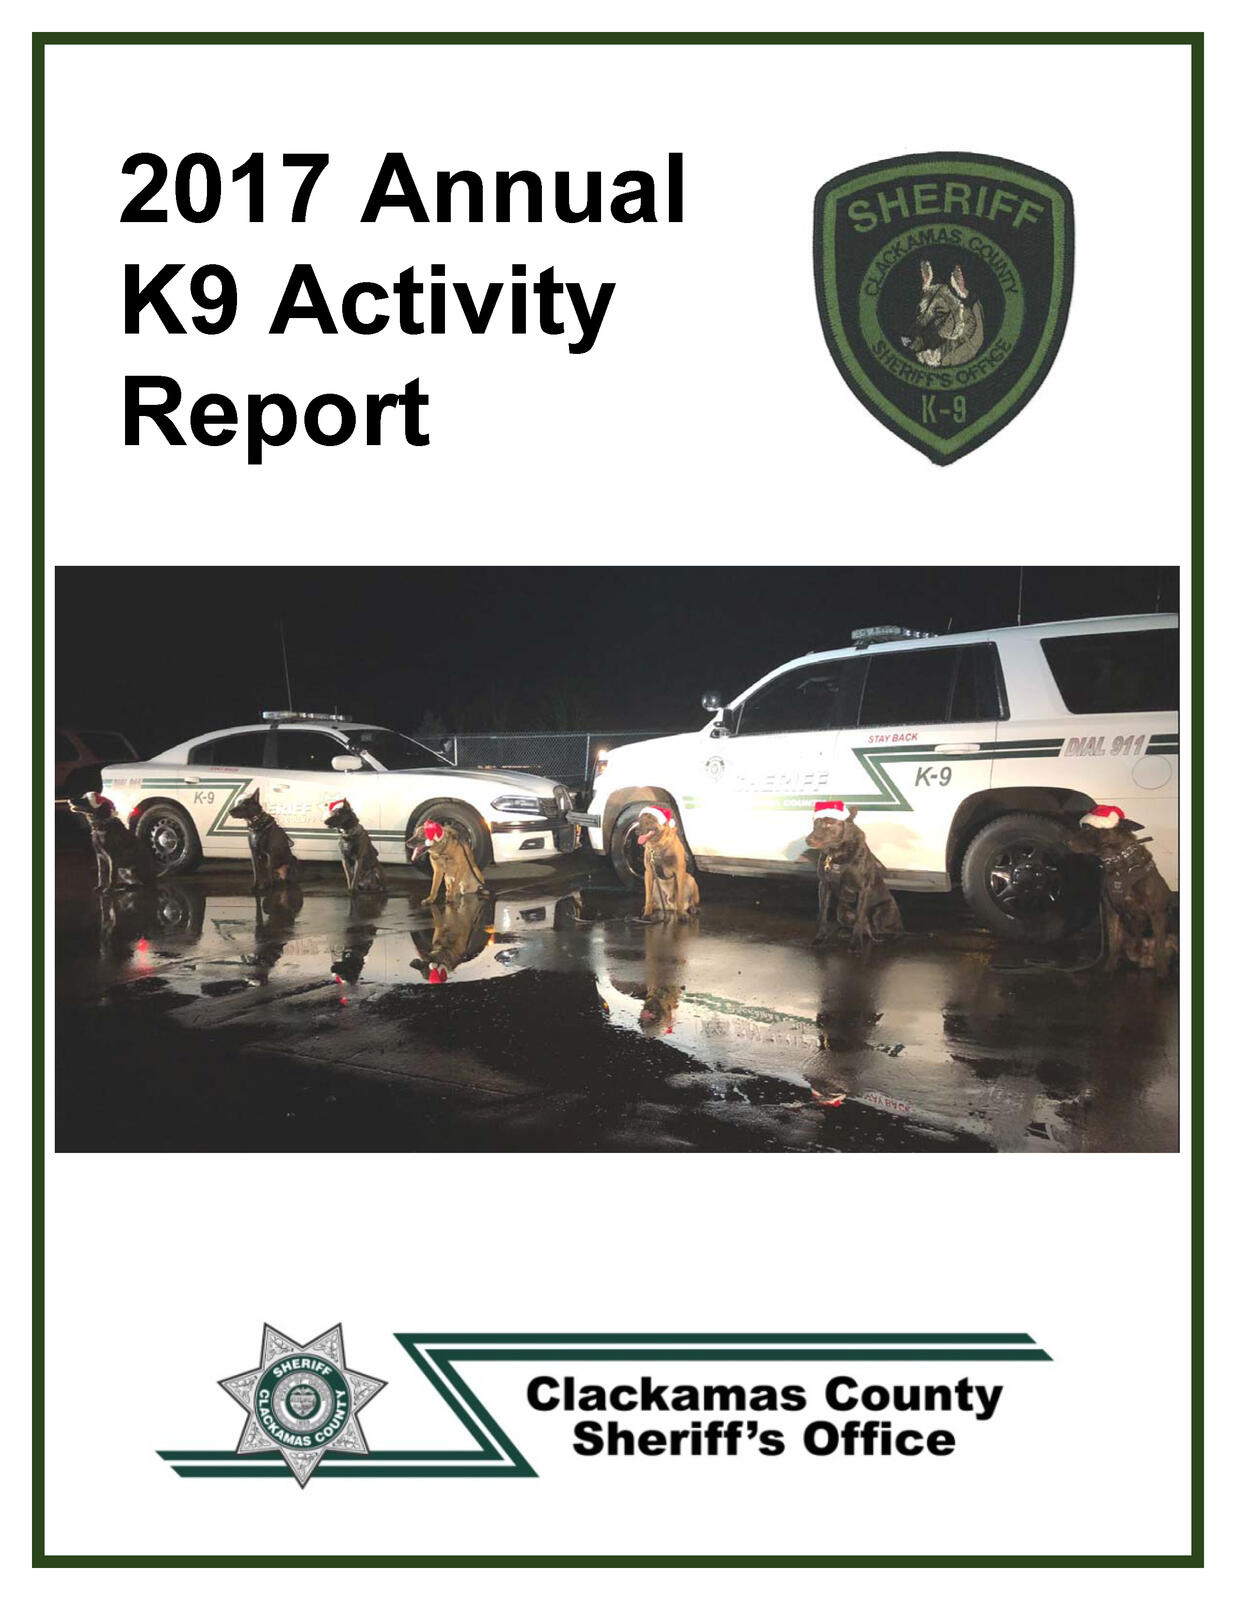 NOW ONLINE: 2017 K9 Unit Annual Report (Clackamas County